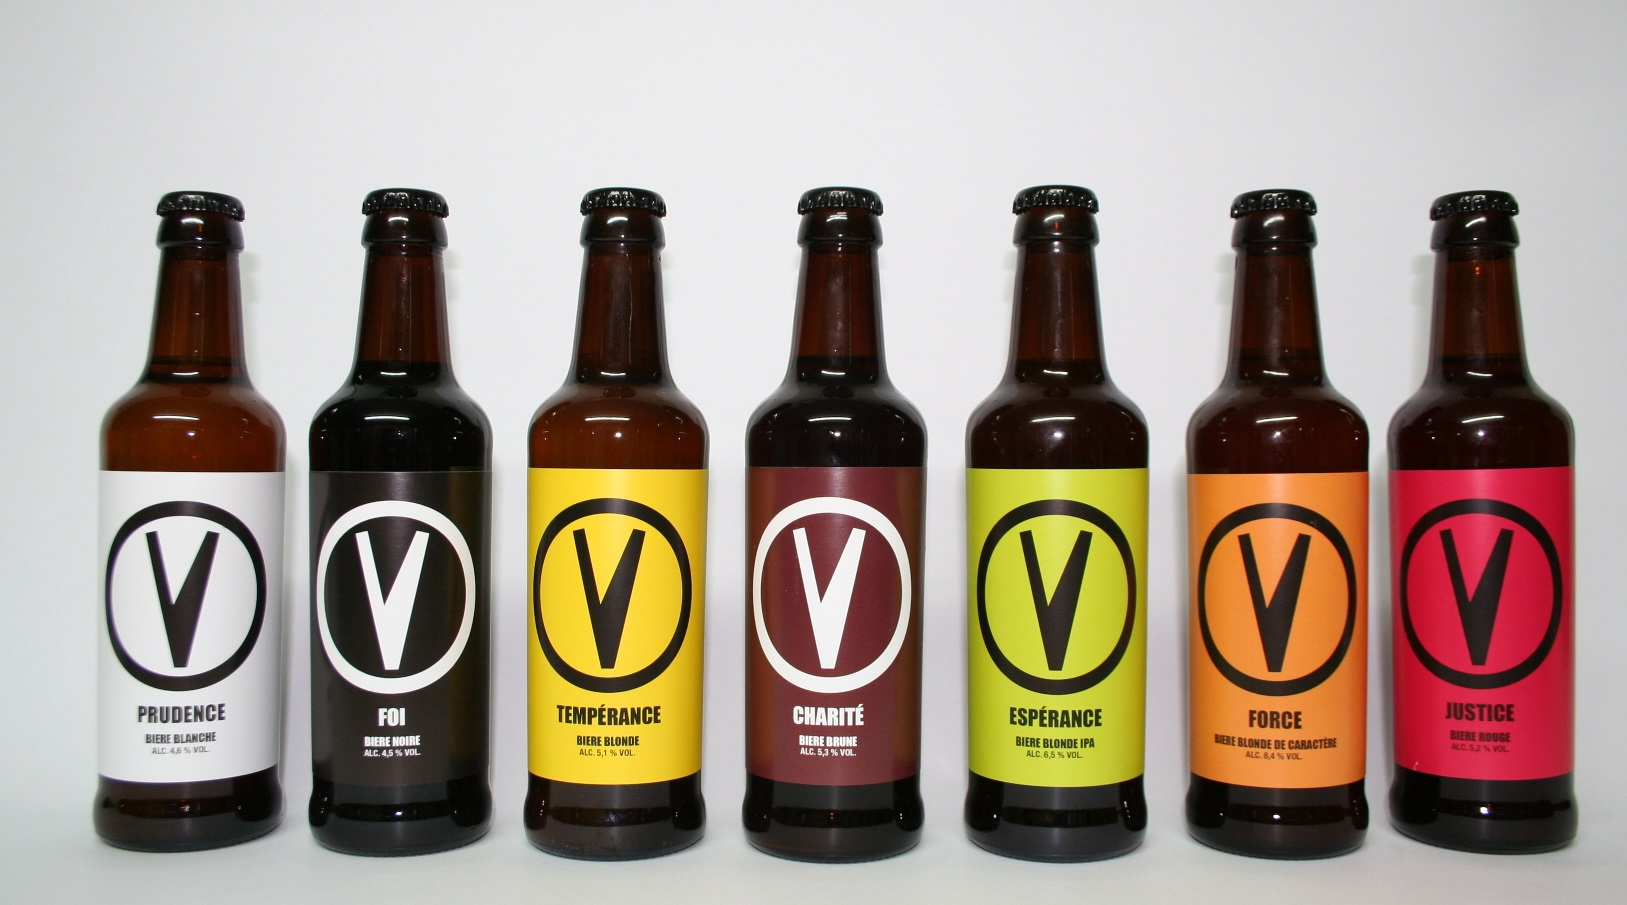 Brouwerij La Vertueuse